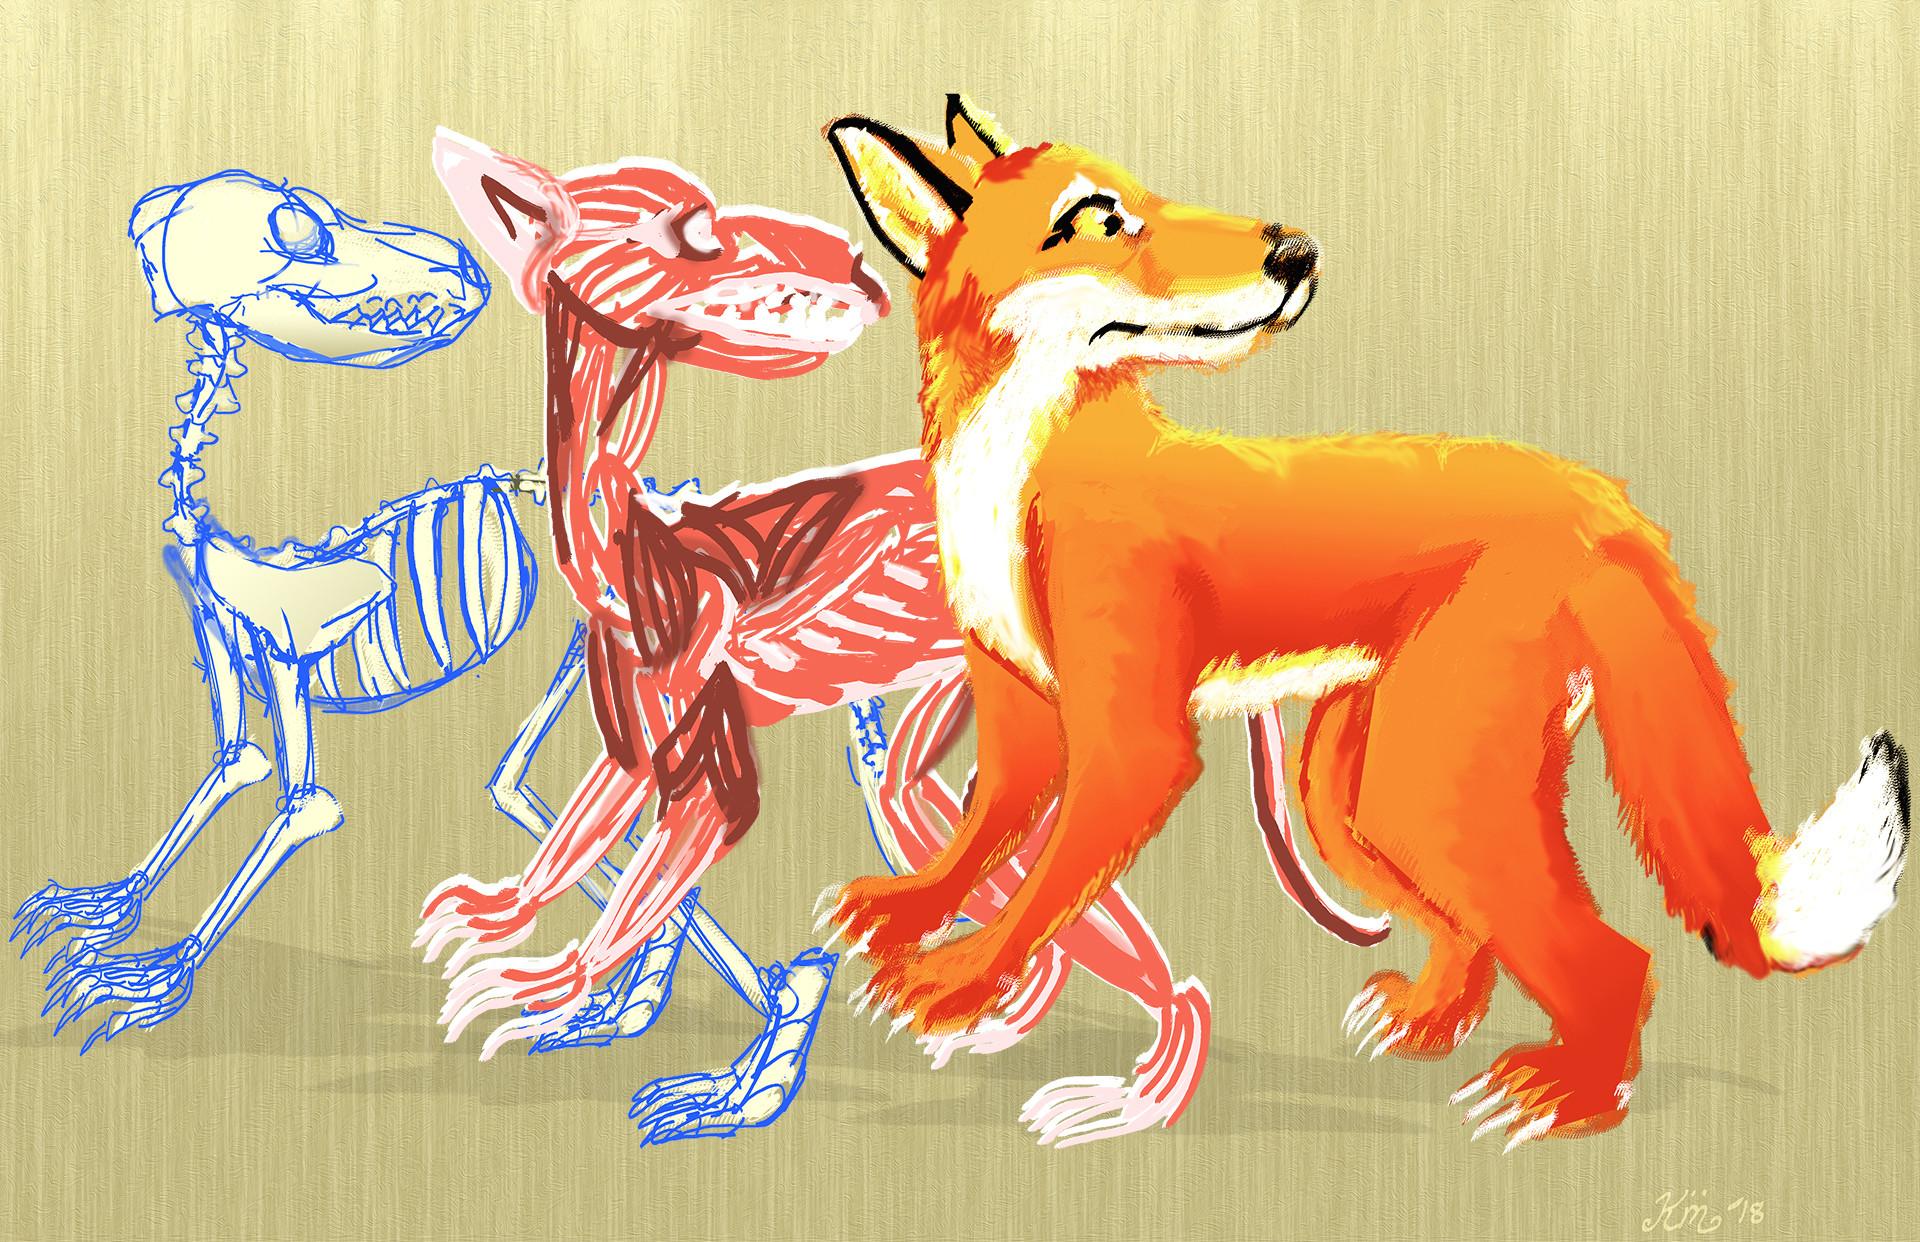 ArtStation - Idleness-Cartoon Fox Anatomy, Kate Mergener